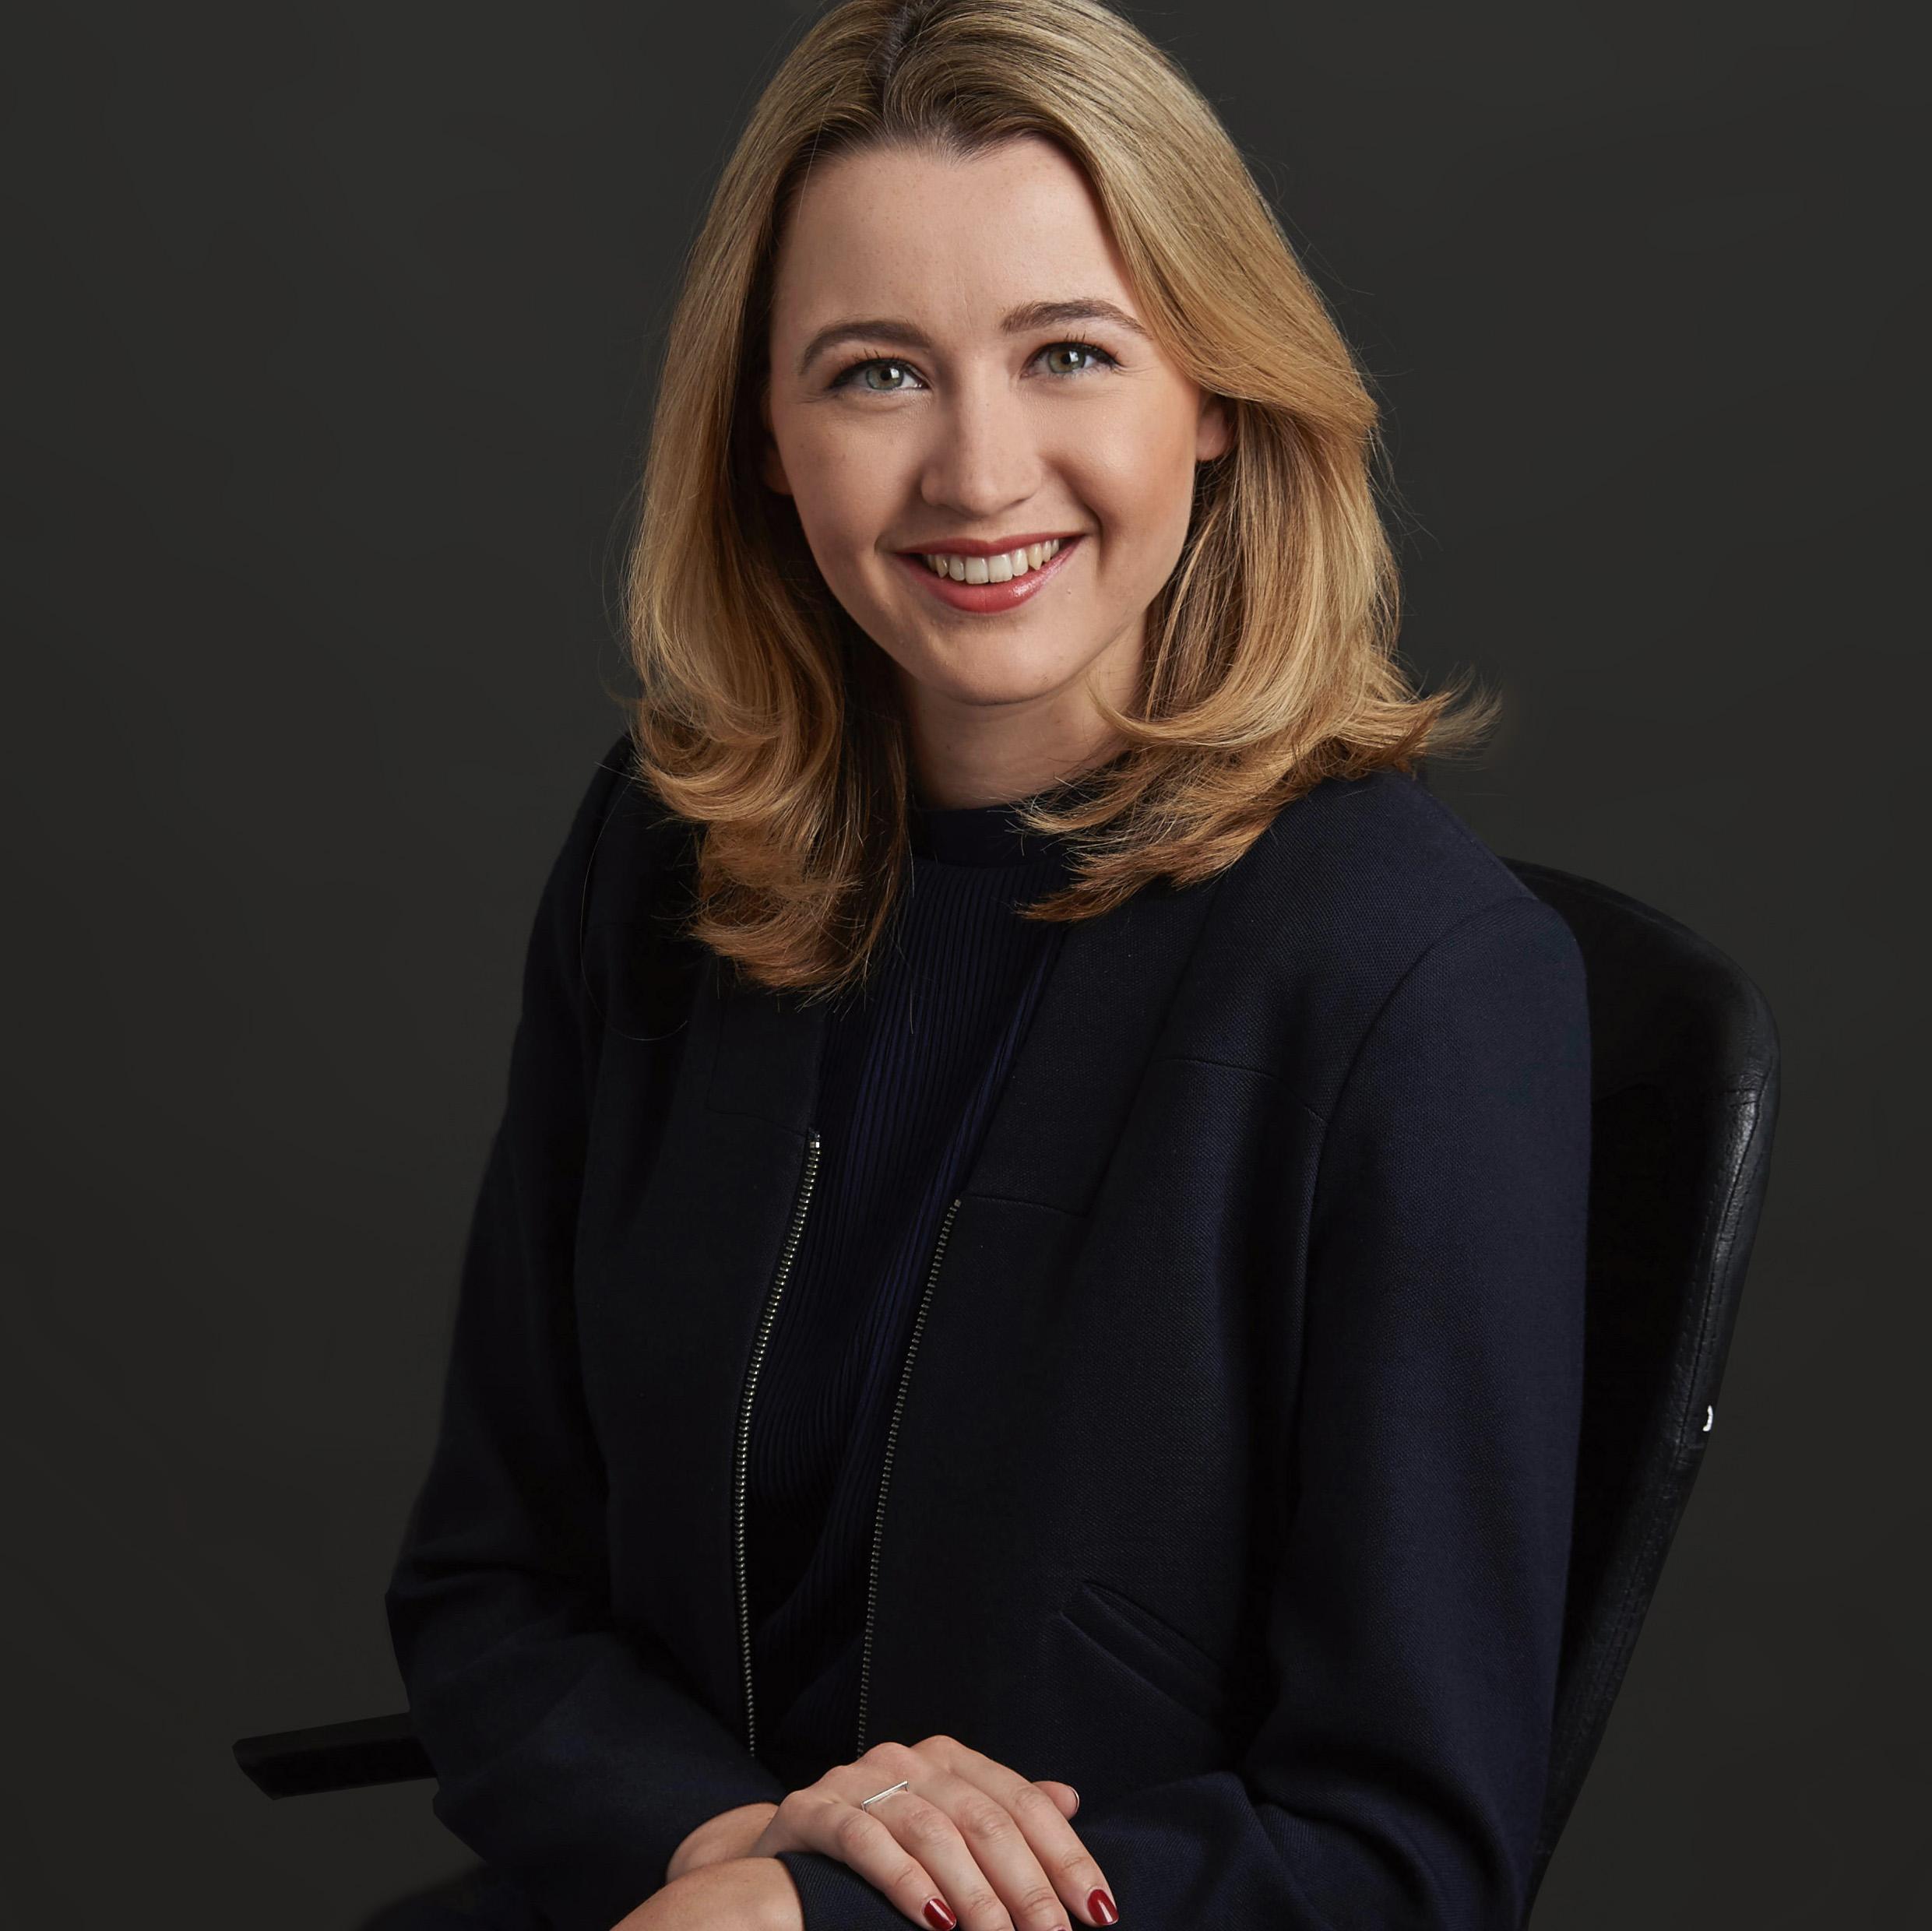 Olivia Waddell